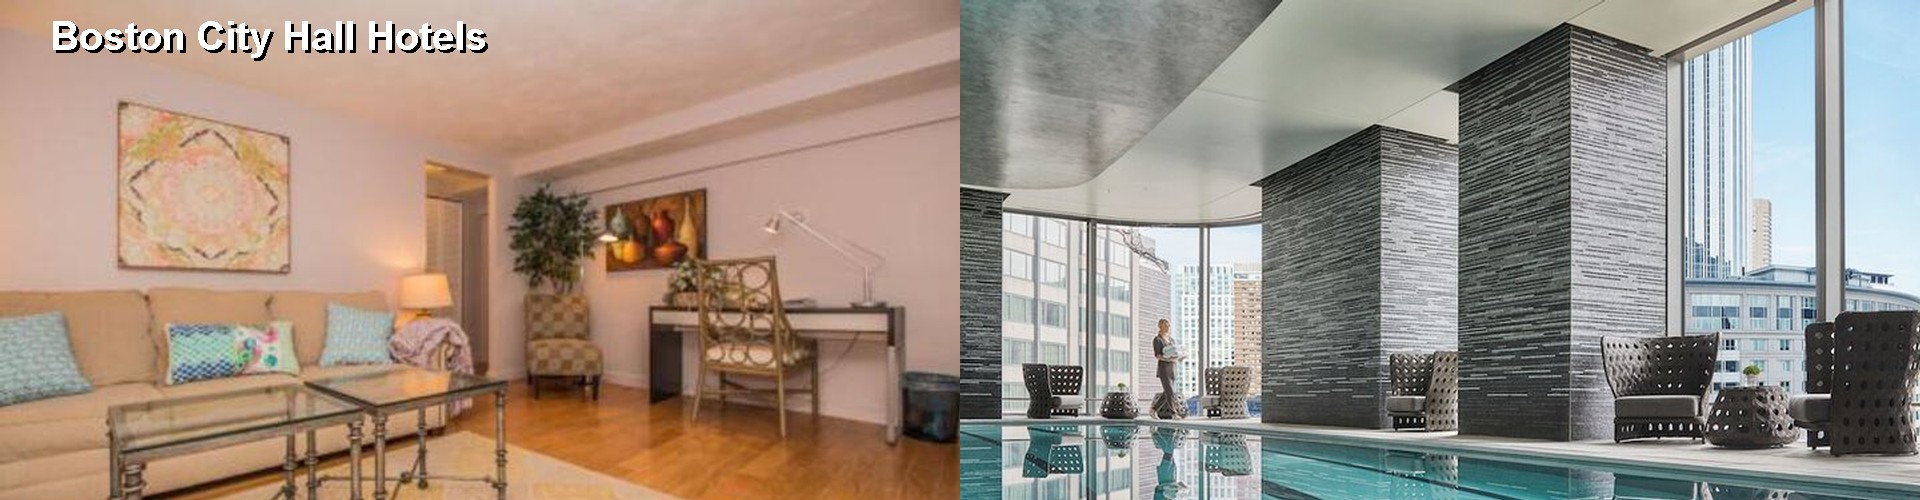 5 Best Hotels Near Boston City Hall